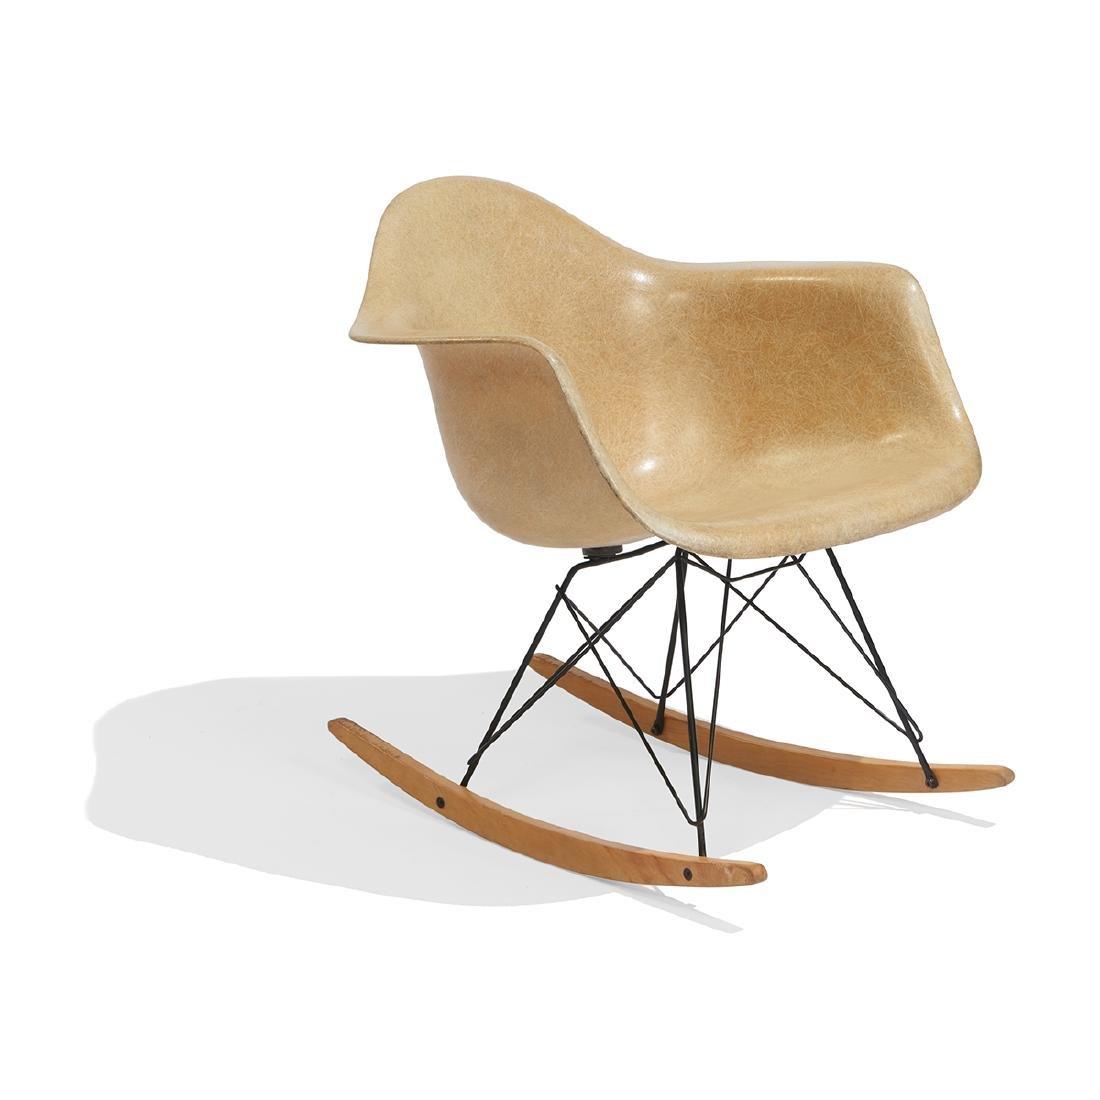 Eames / Herman Miller RAR rocking chair